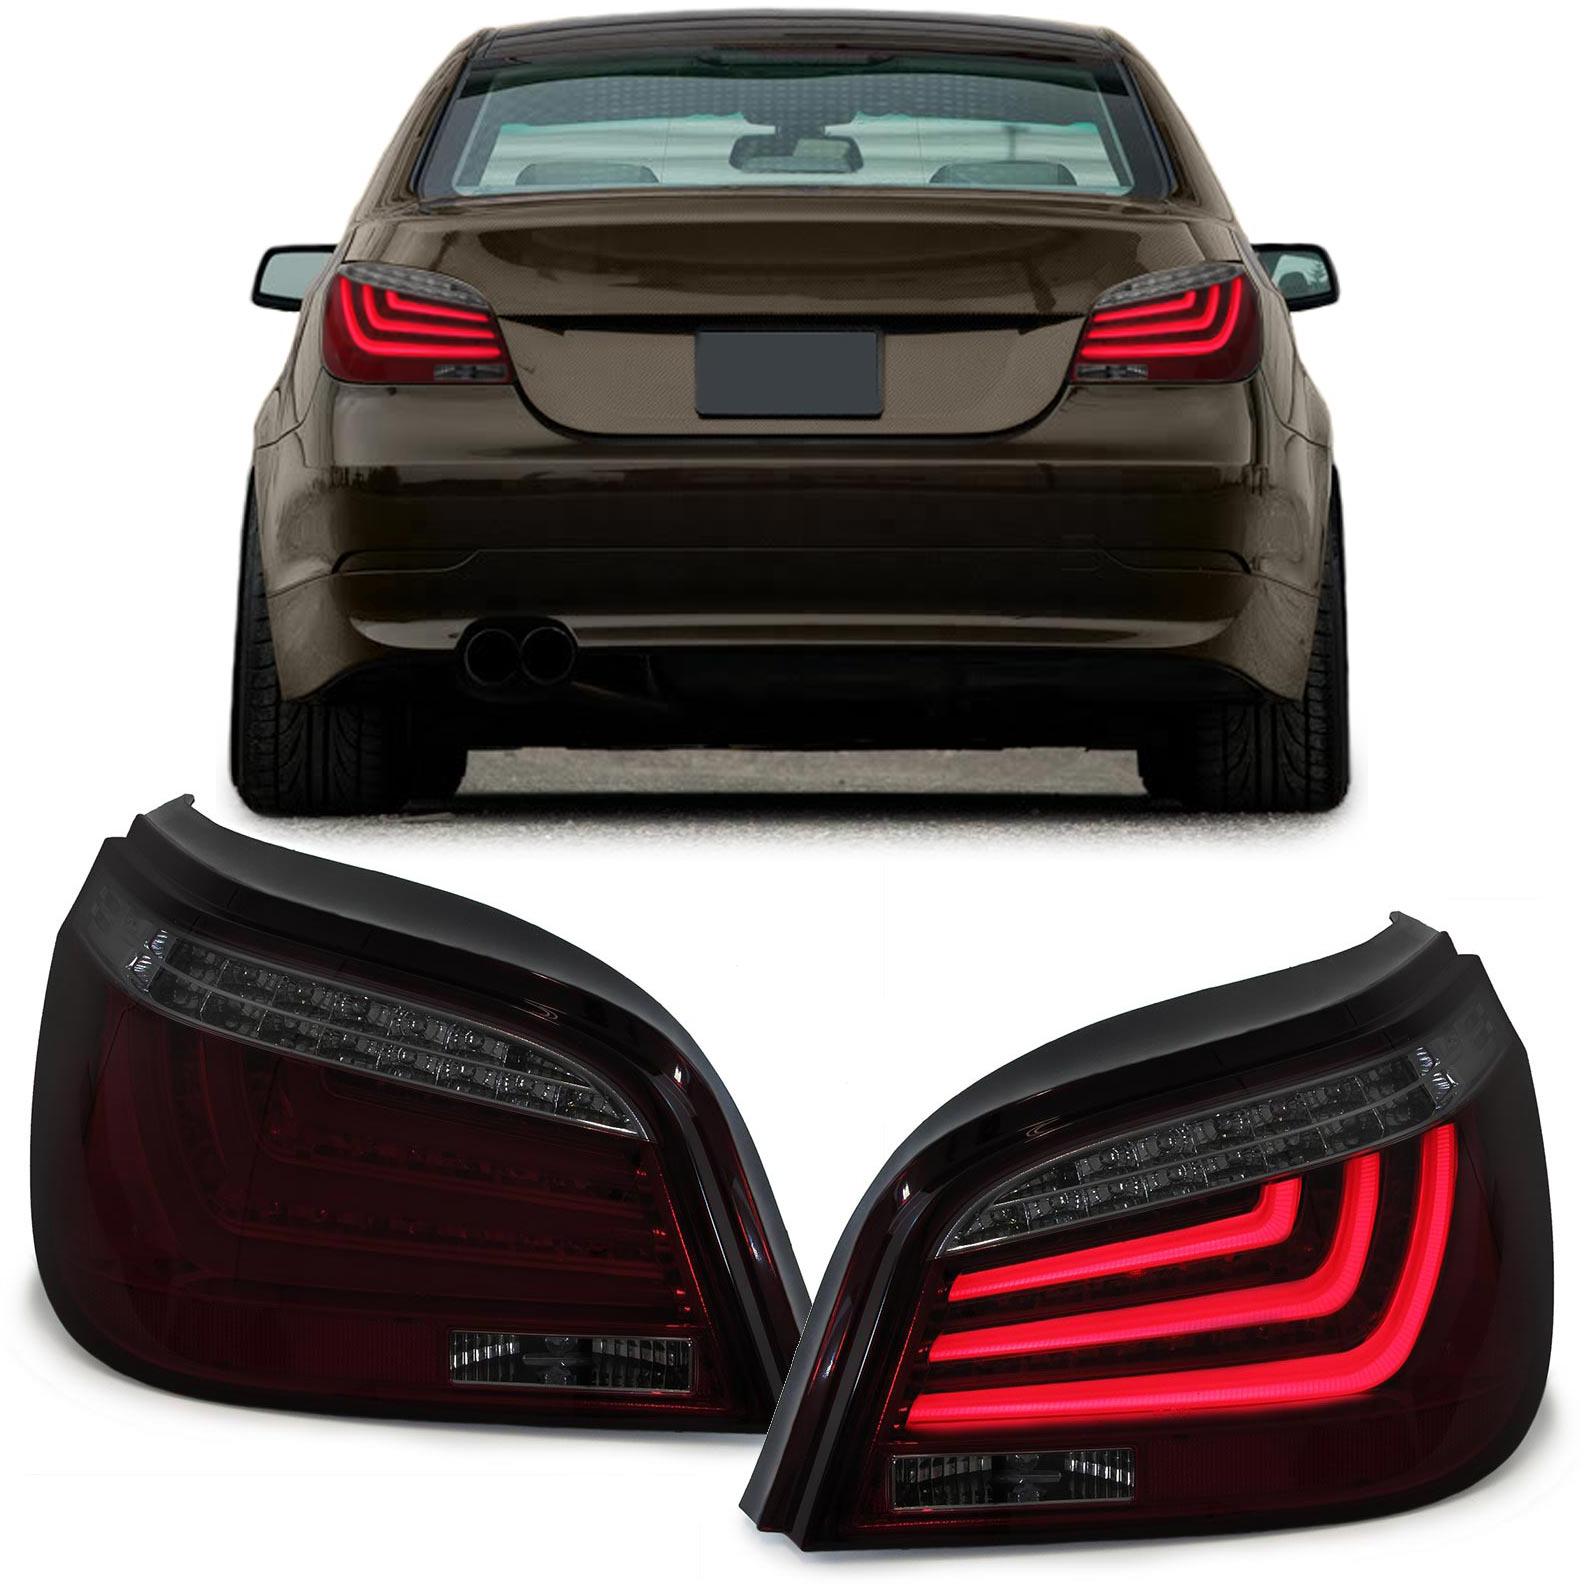 LED Lightbar Klarglas Rückleuchten mit LED Blinker rot schwarz für BMW 5er E60